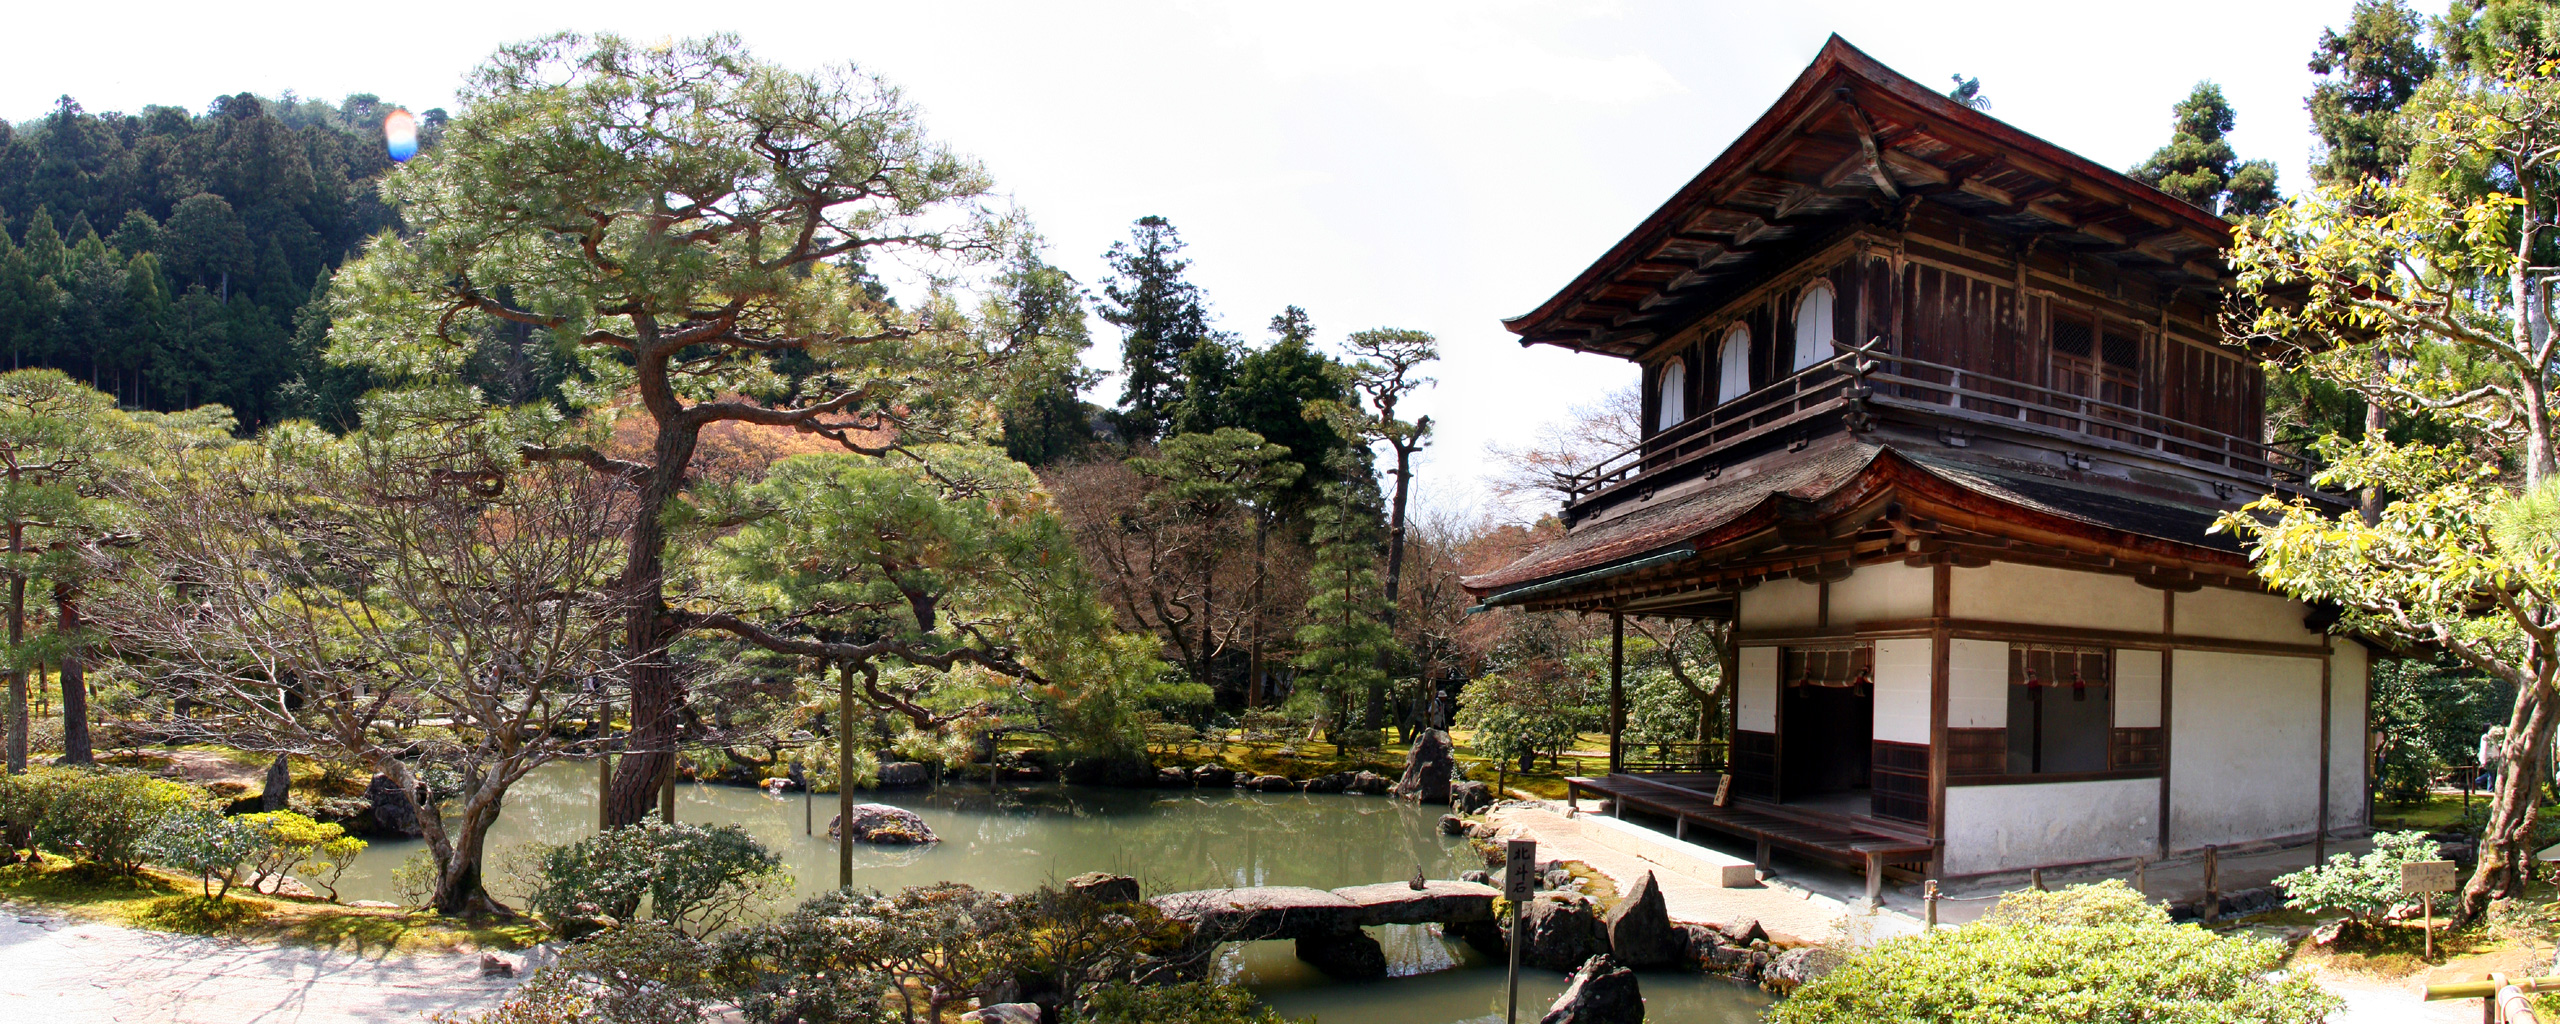 Japanese Zen Land Wallpapers Japanese Zen Land Myspace Backgrounds 2560x1024